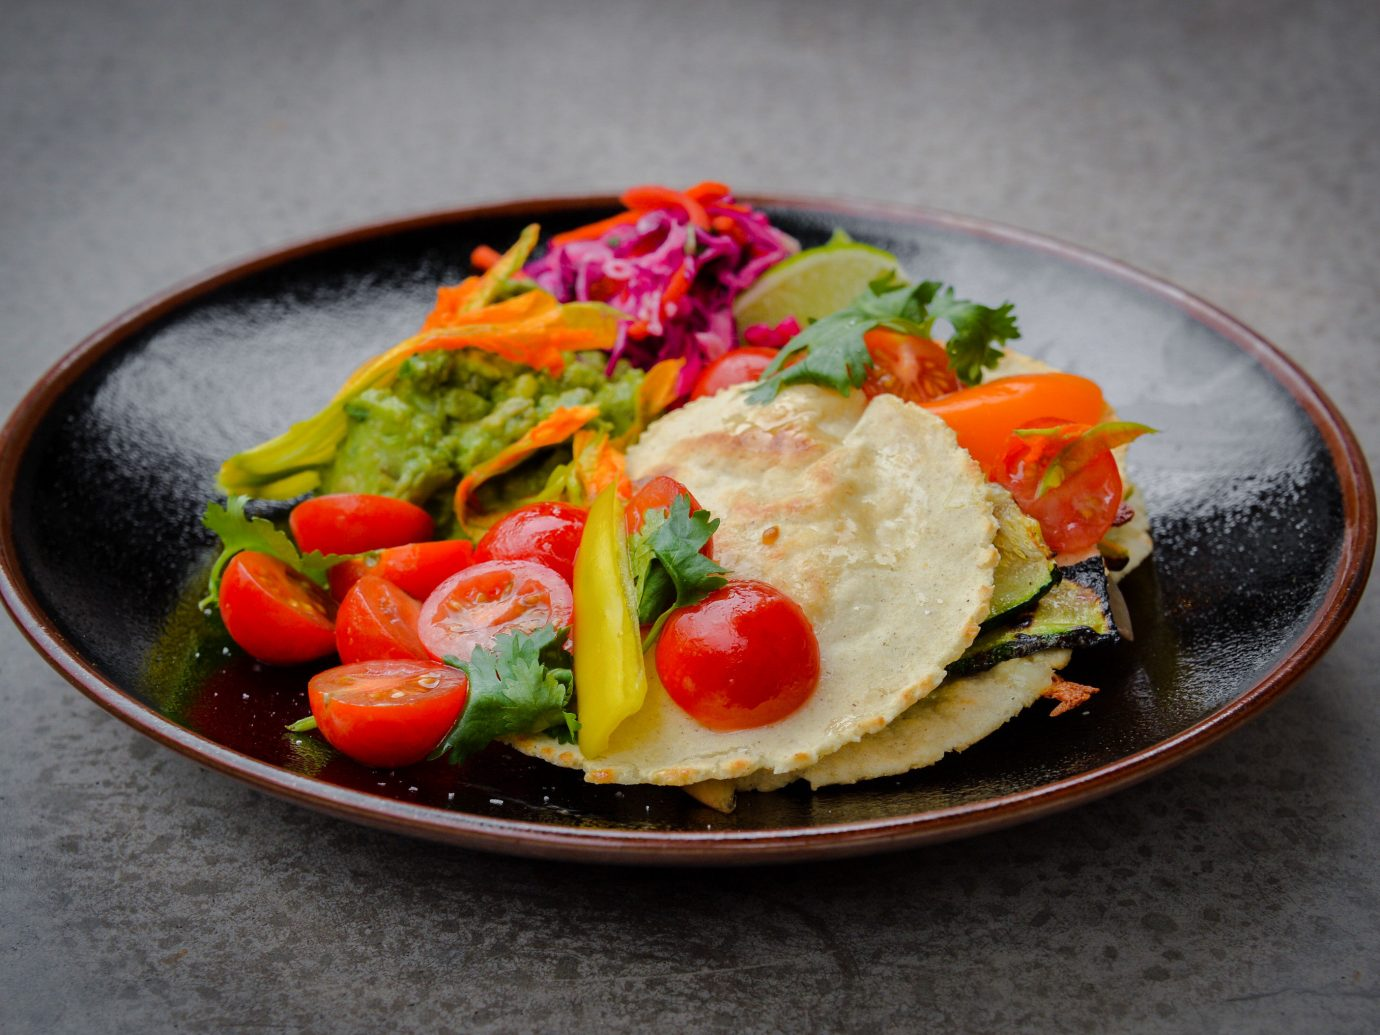 Trip Ideas food plate dish salad meal cuisine produce fish lunch breakfast vegetable vegetarian food tomato